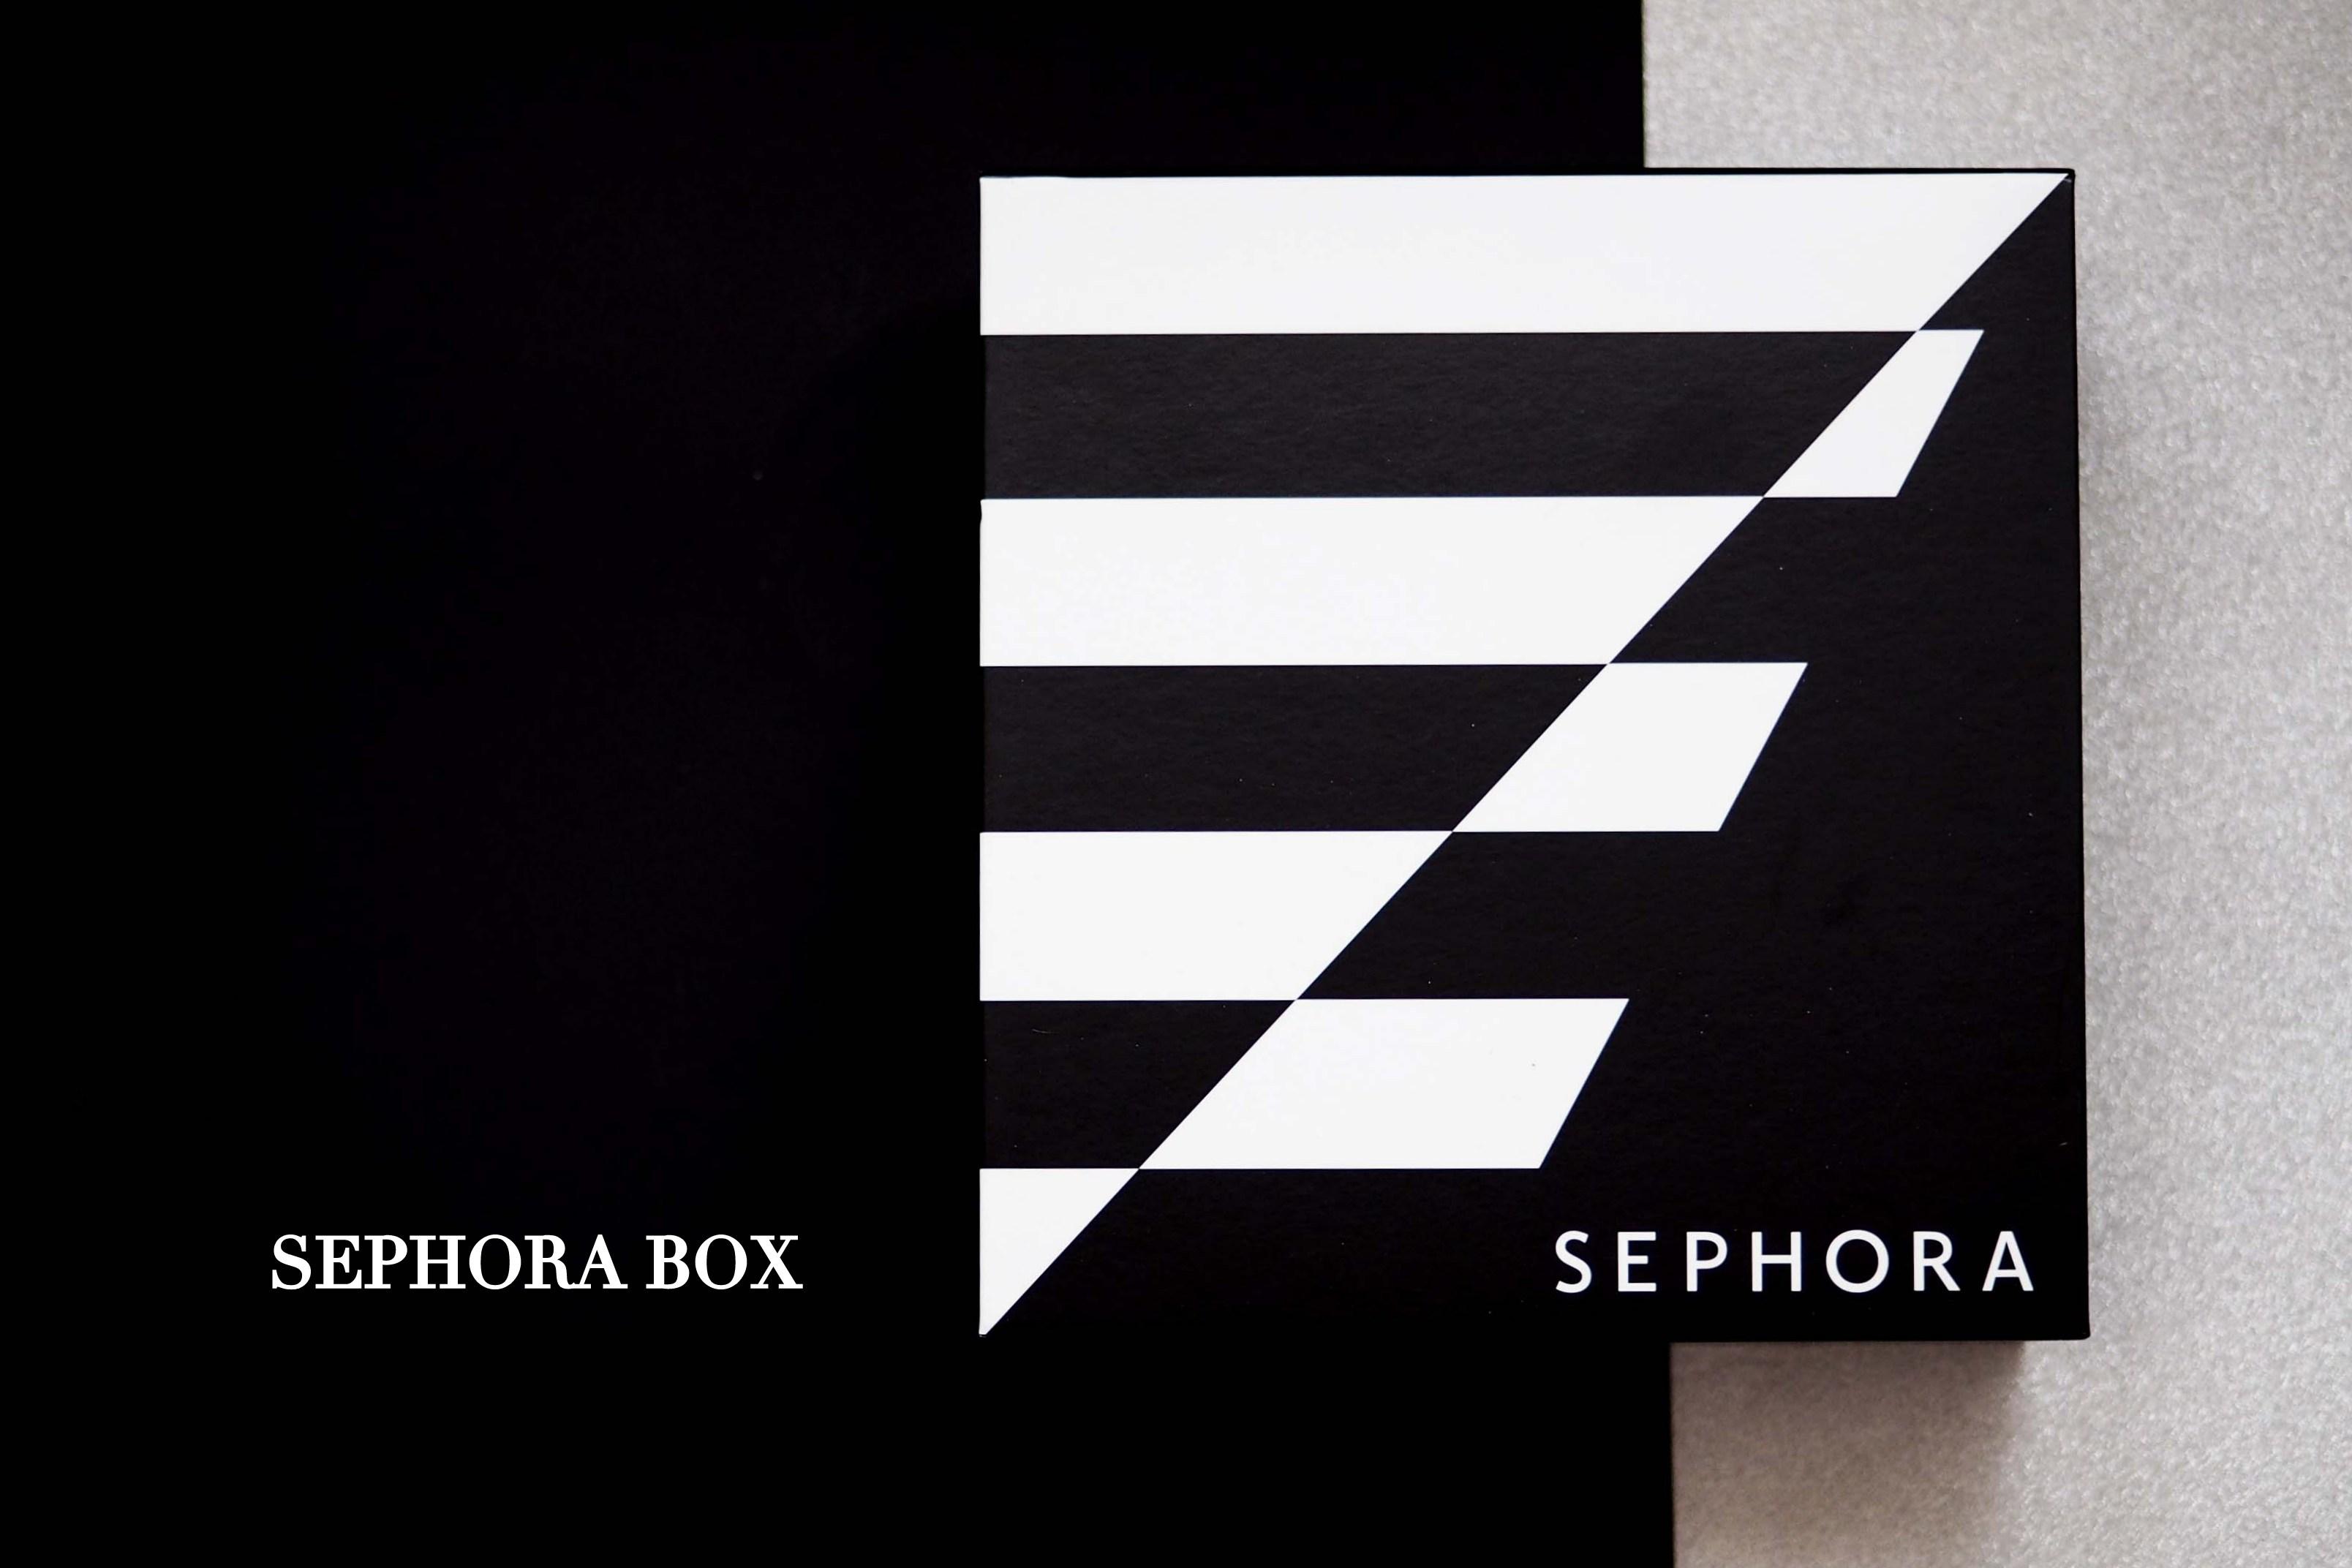 SEPHORA BOX BLOG